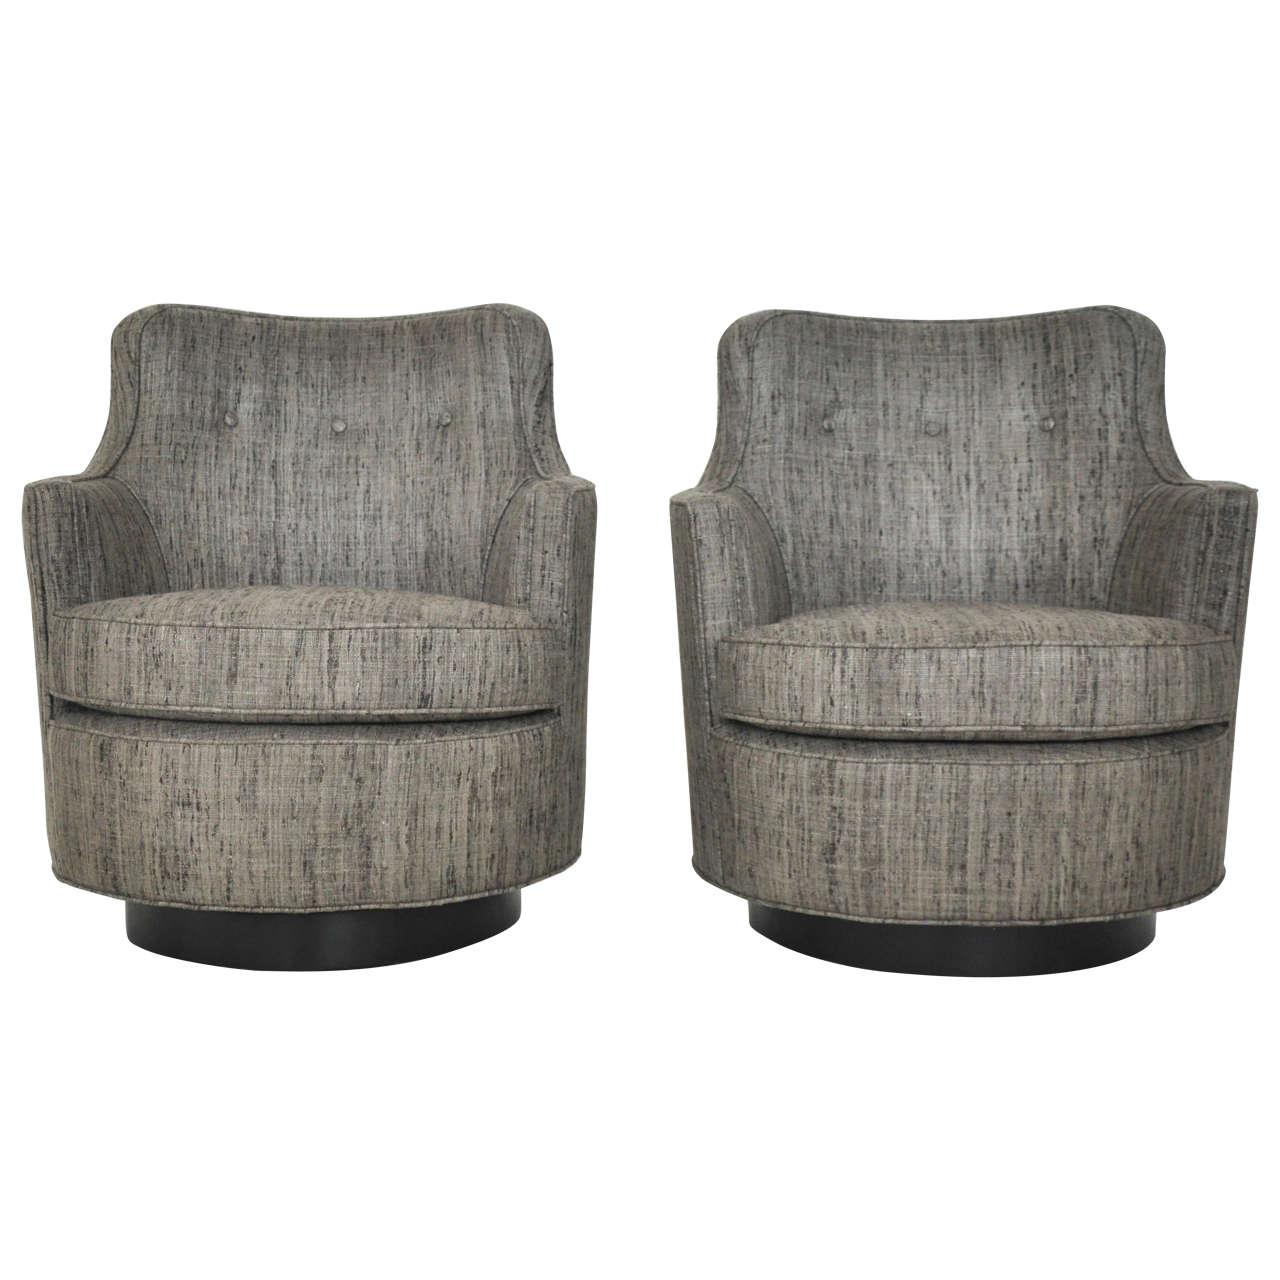 Dunbar swivel lounge chairs by edward wormley at 1stdibs - Edward wormley chairs ...